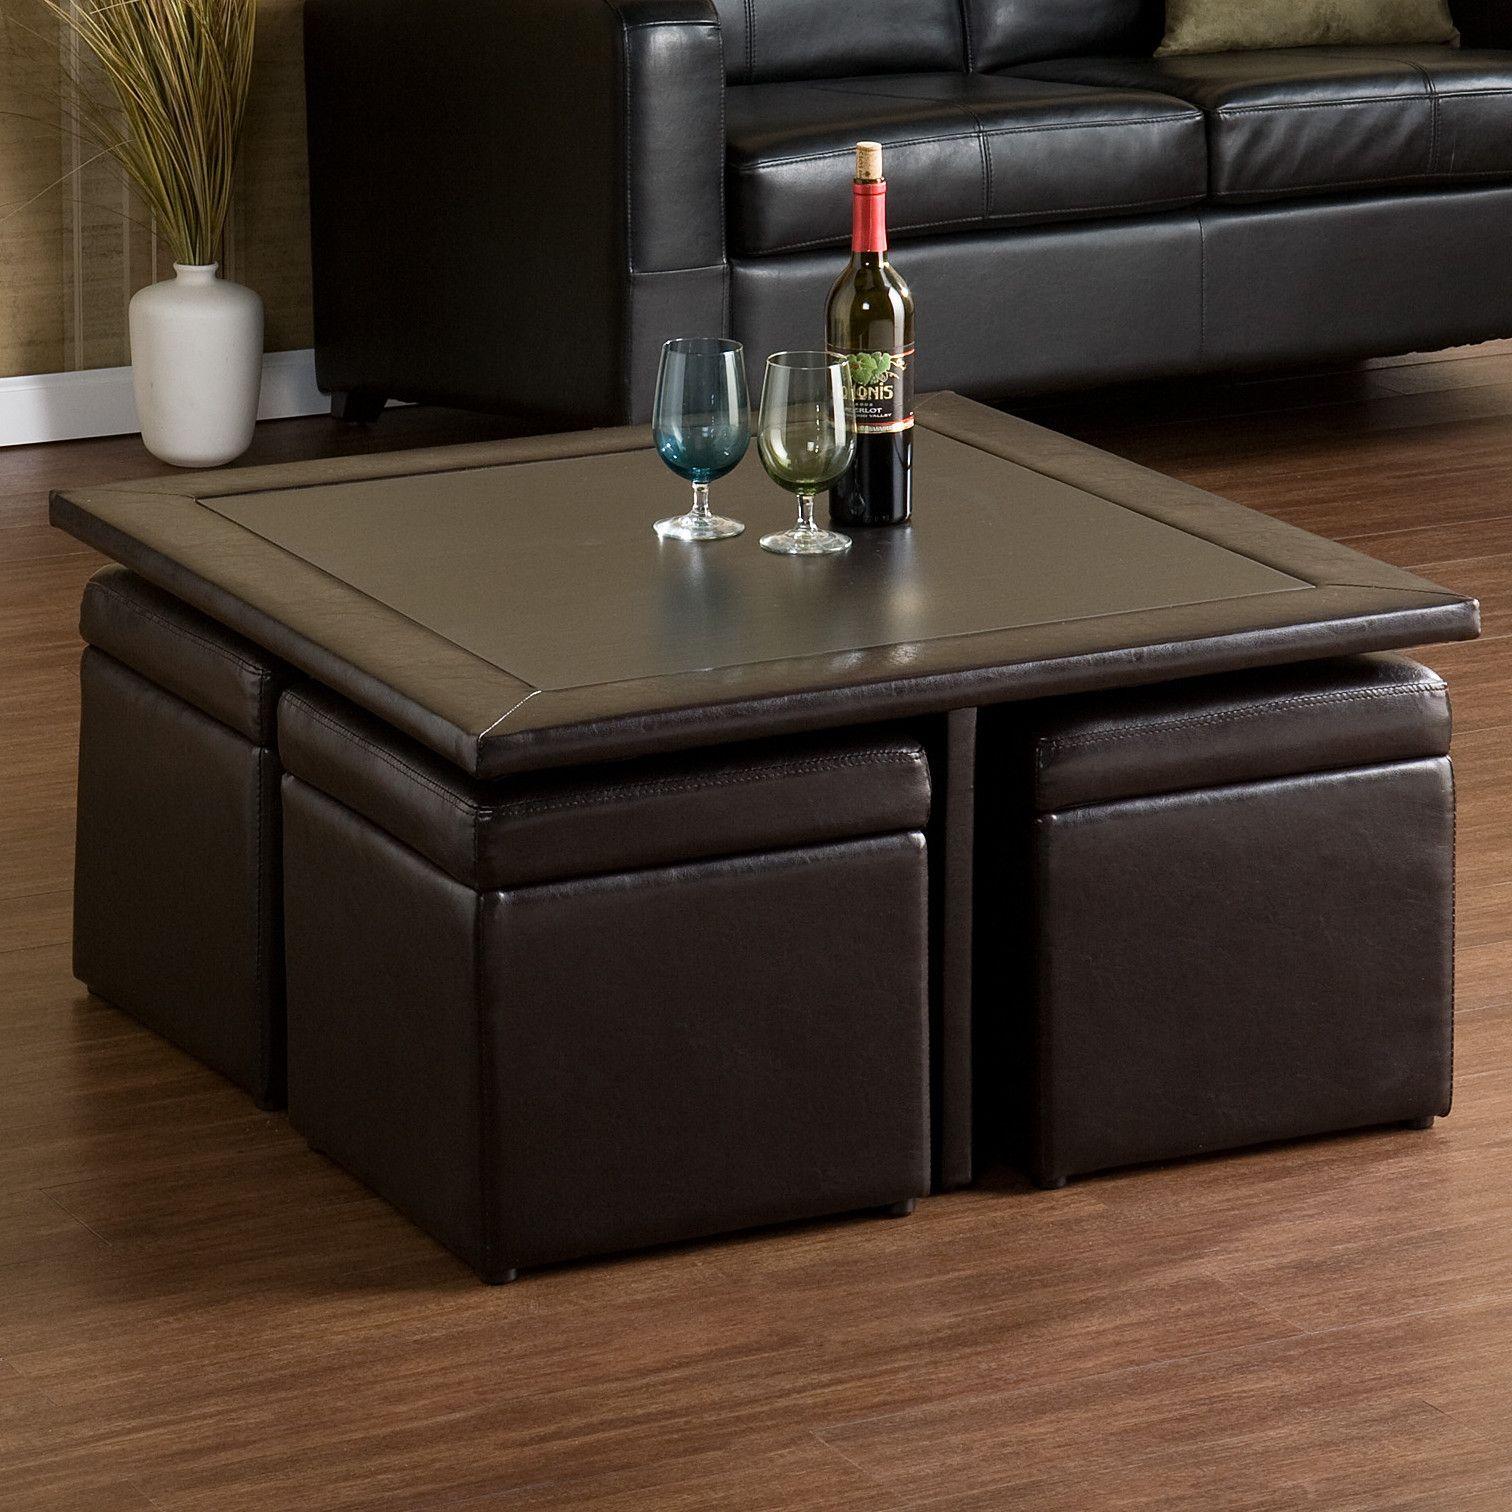 wildon home ® pennington storage cube/ coffee table set & reviews